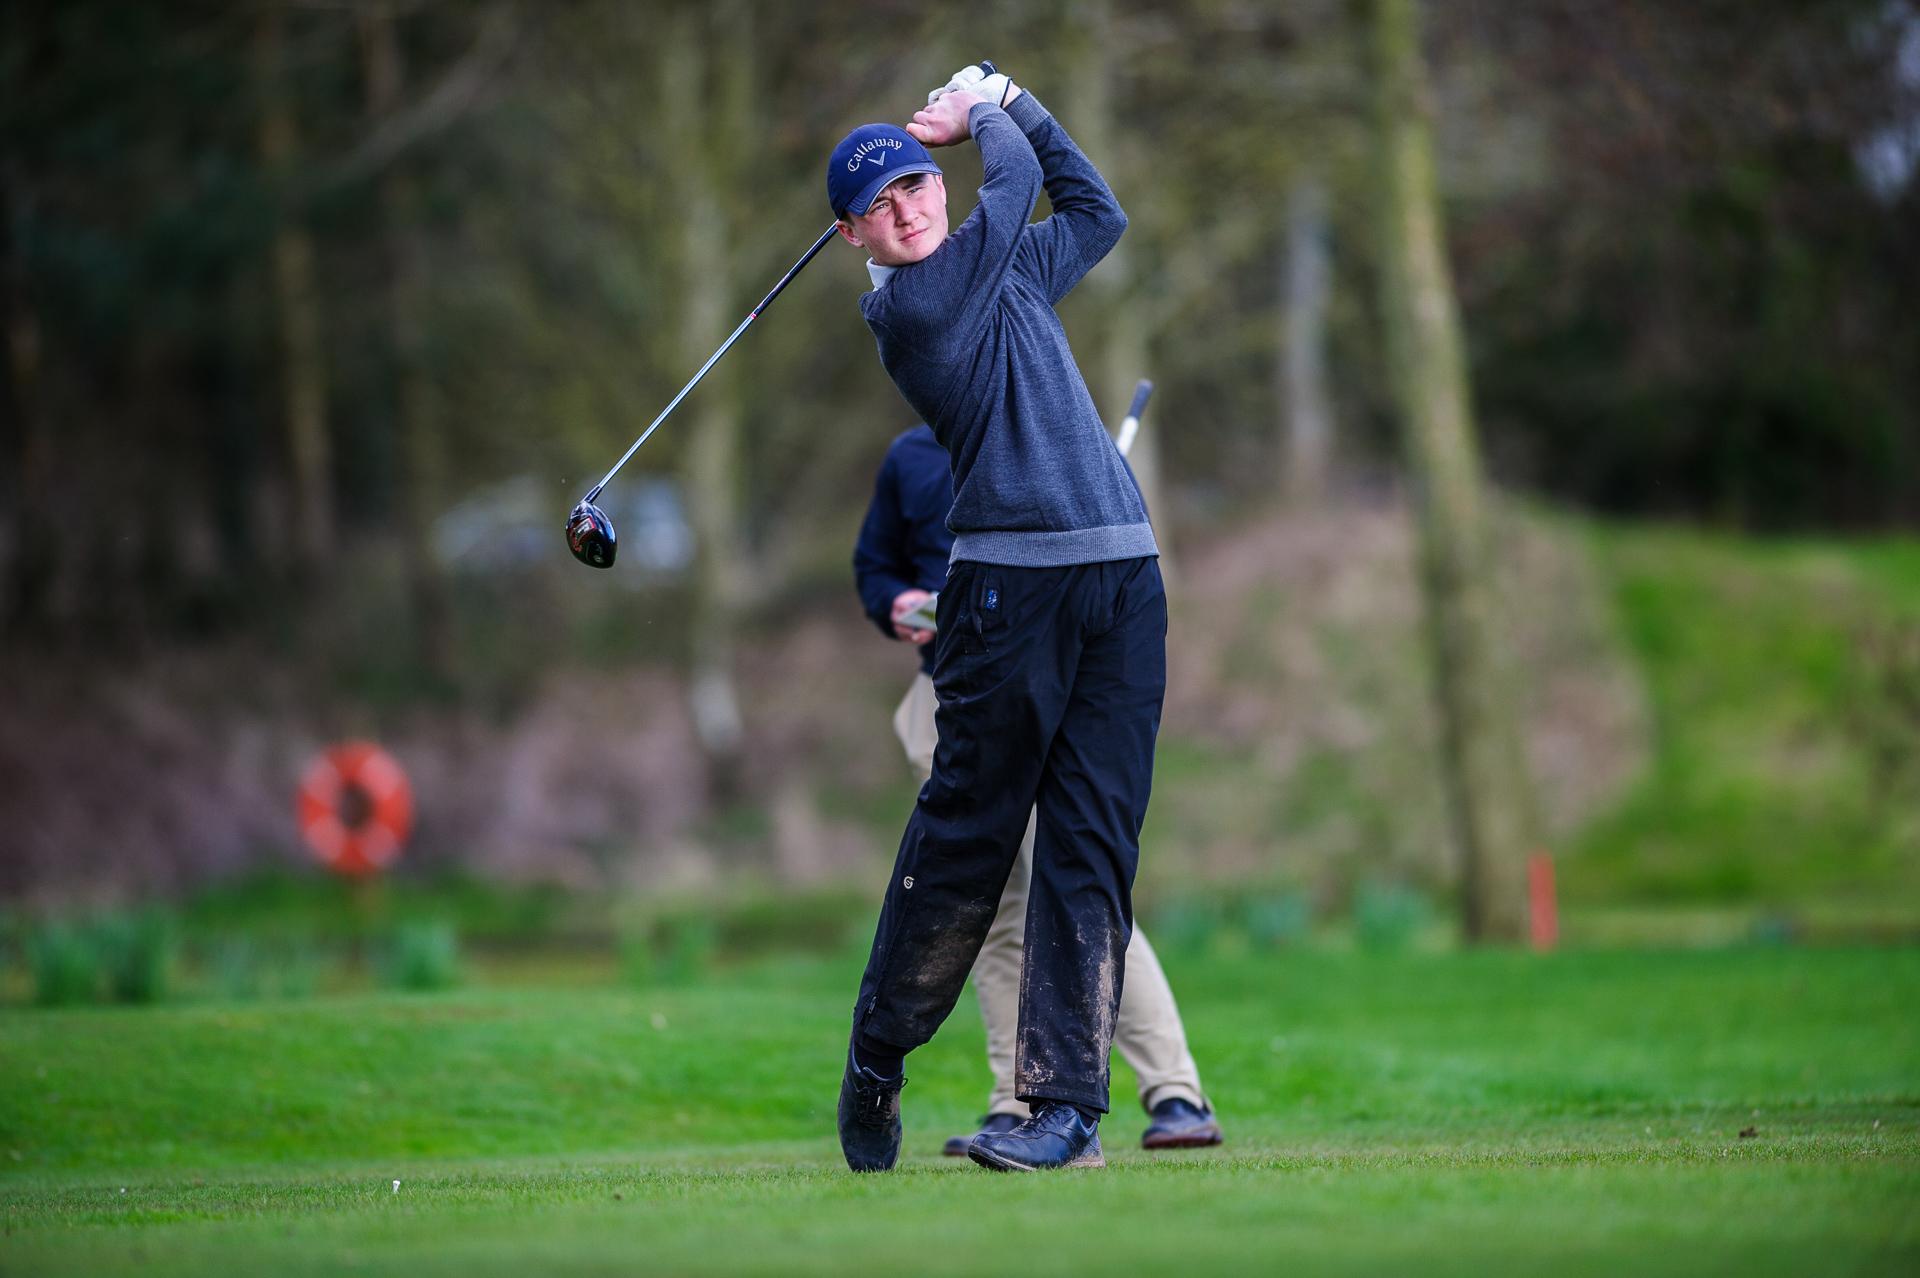 Kevindiss.com golf course photography Hawkstone Park golf course-2-16.jpg